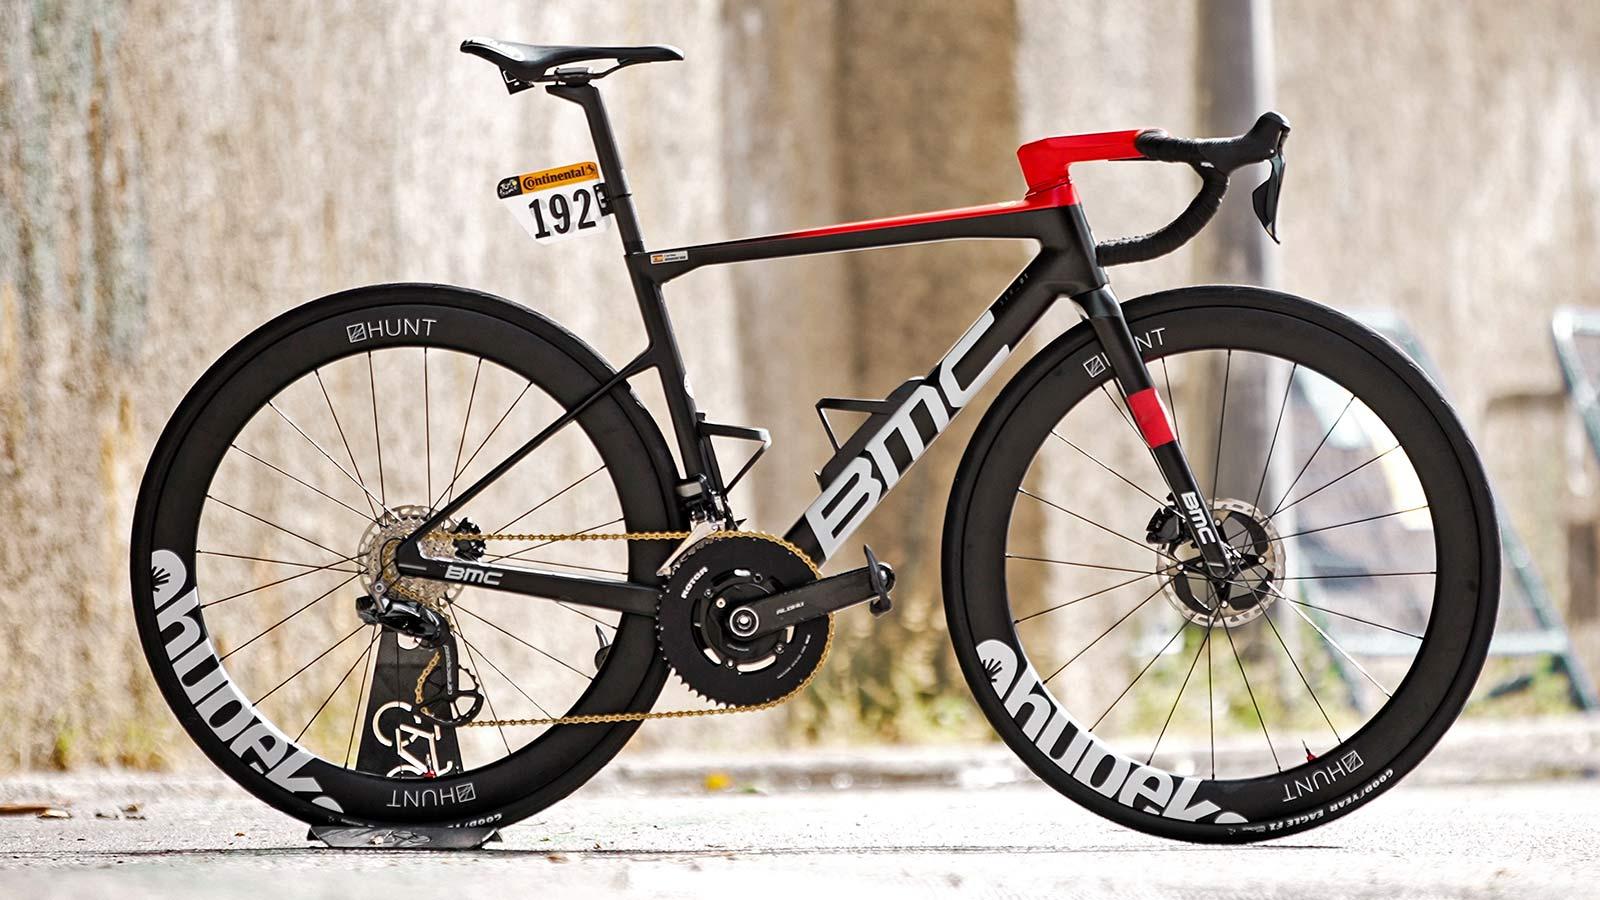 Qhubeka x Hunt 54 Aerodynamicist Carbon Disc wheels, Tour de France-raced tubeless carbon aero road wheels for charity, team bike